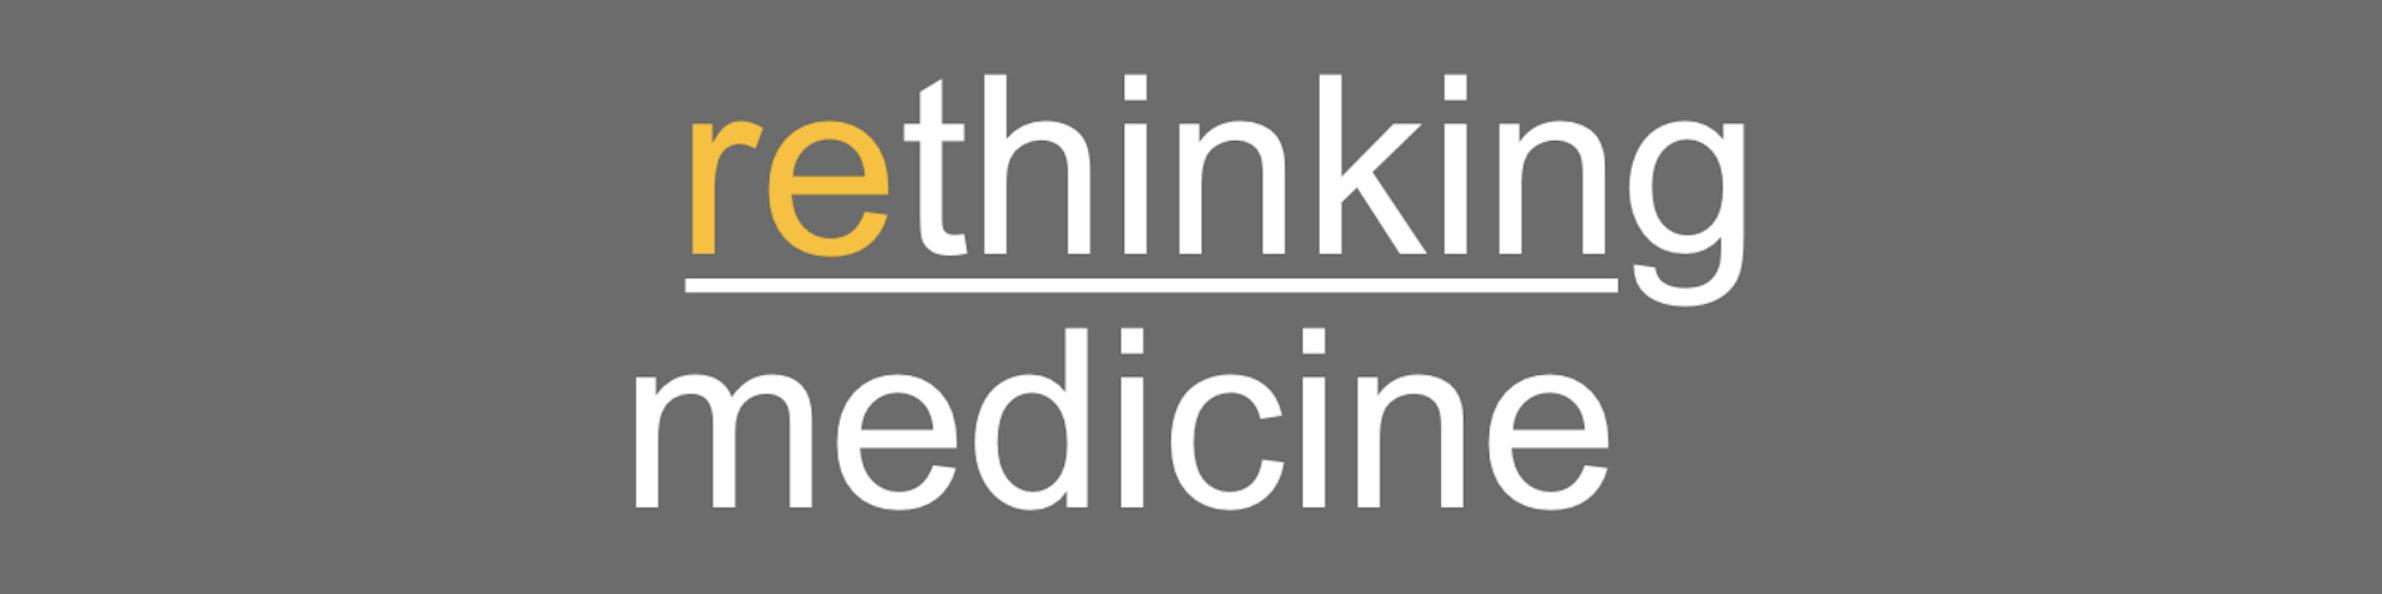 rethinking medicine